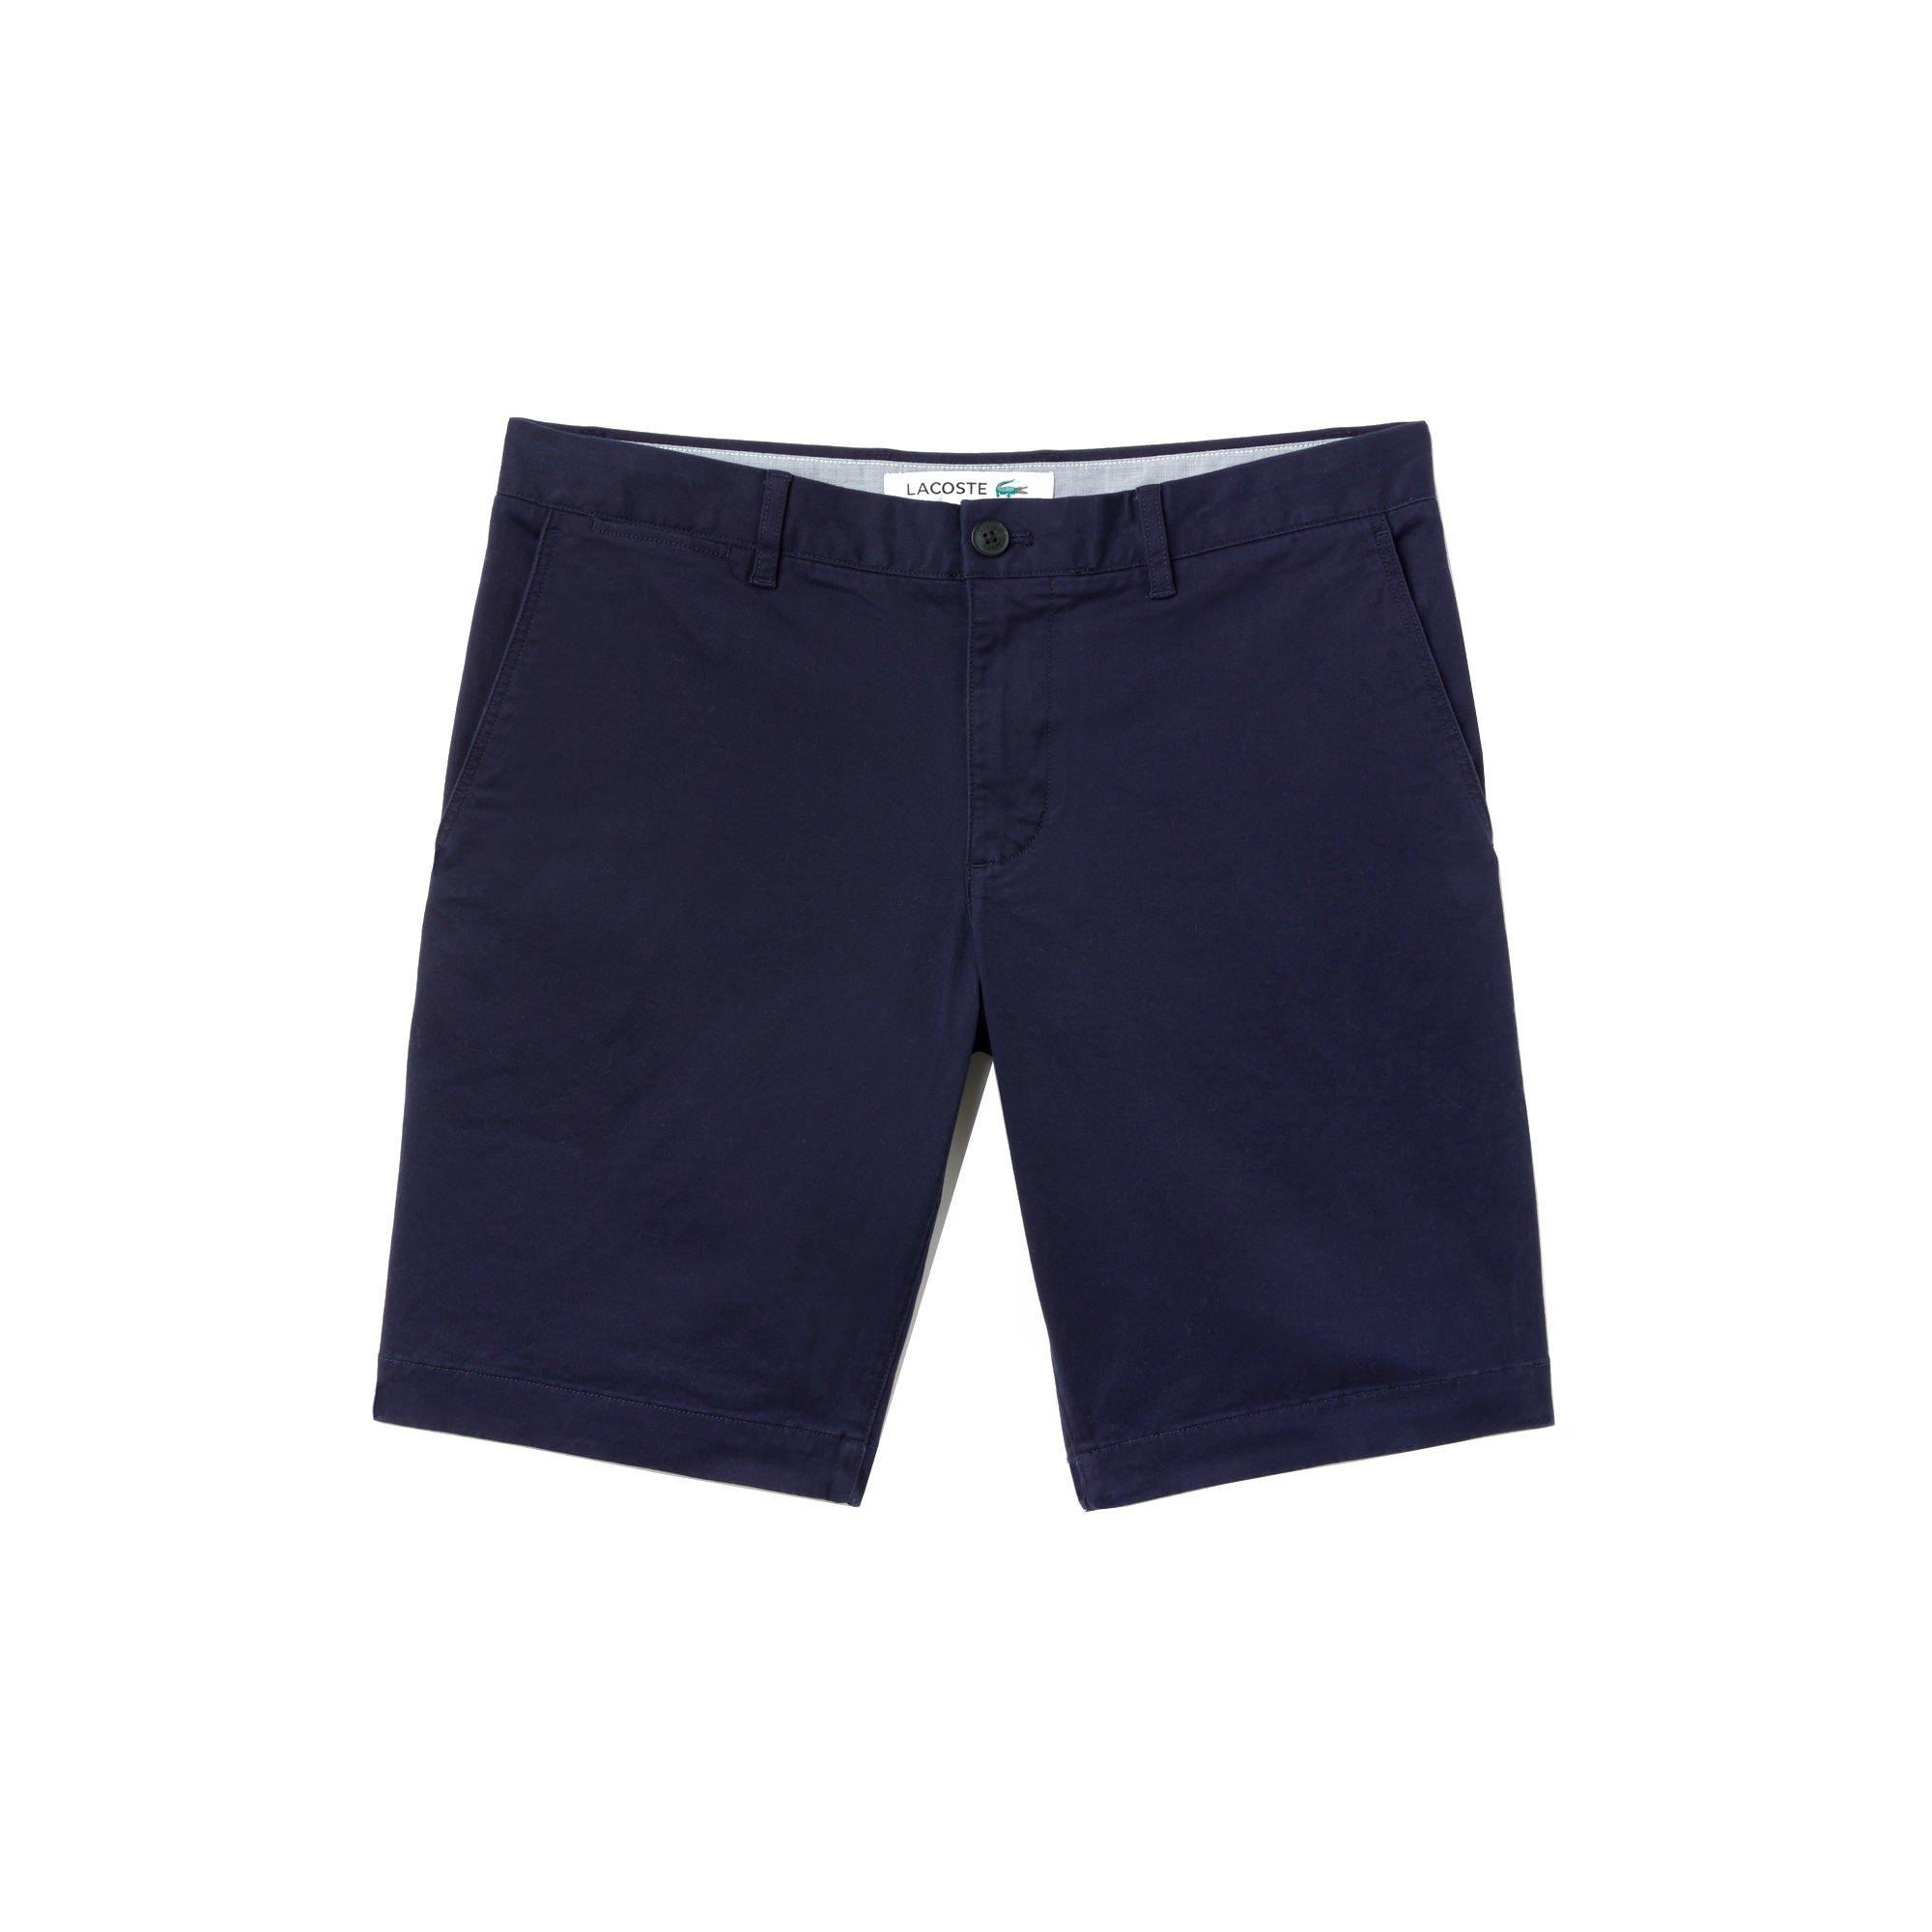 8a60e06927 Men\'s Slim Fit Stretch Gabardine Shorts